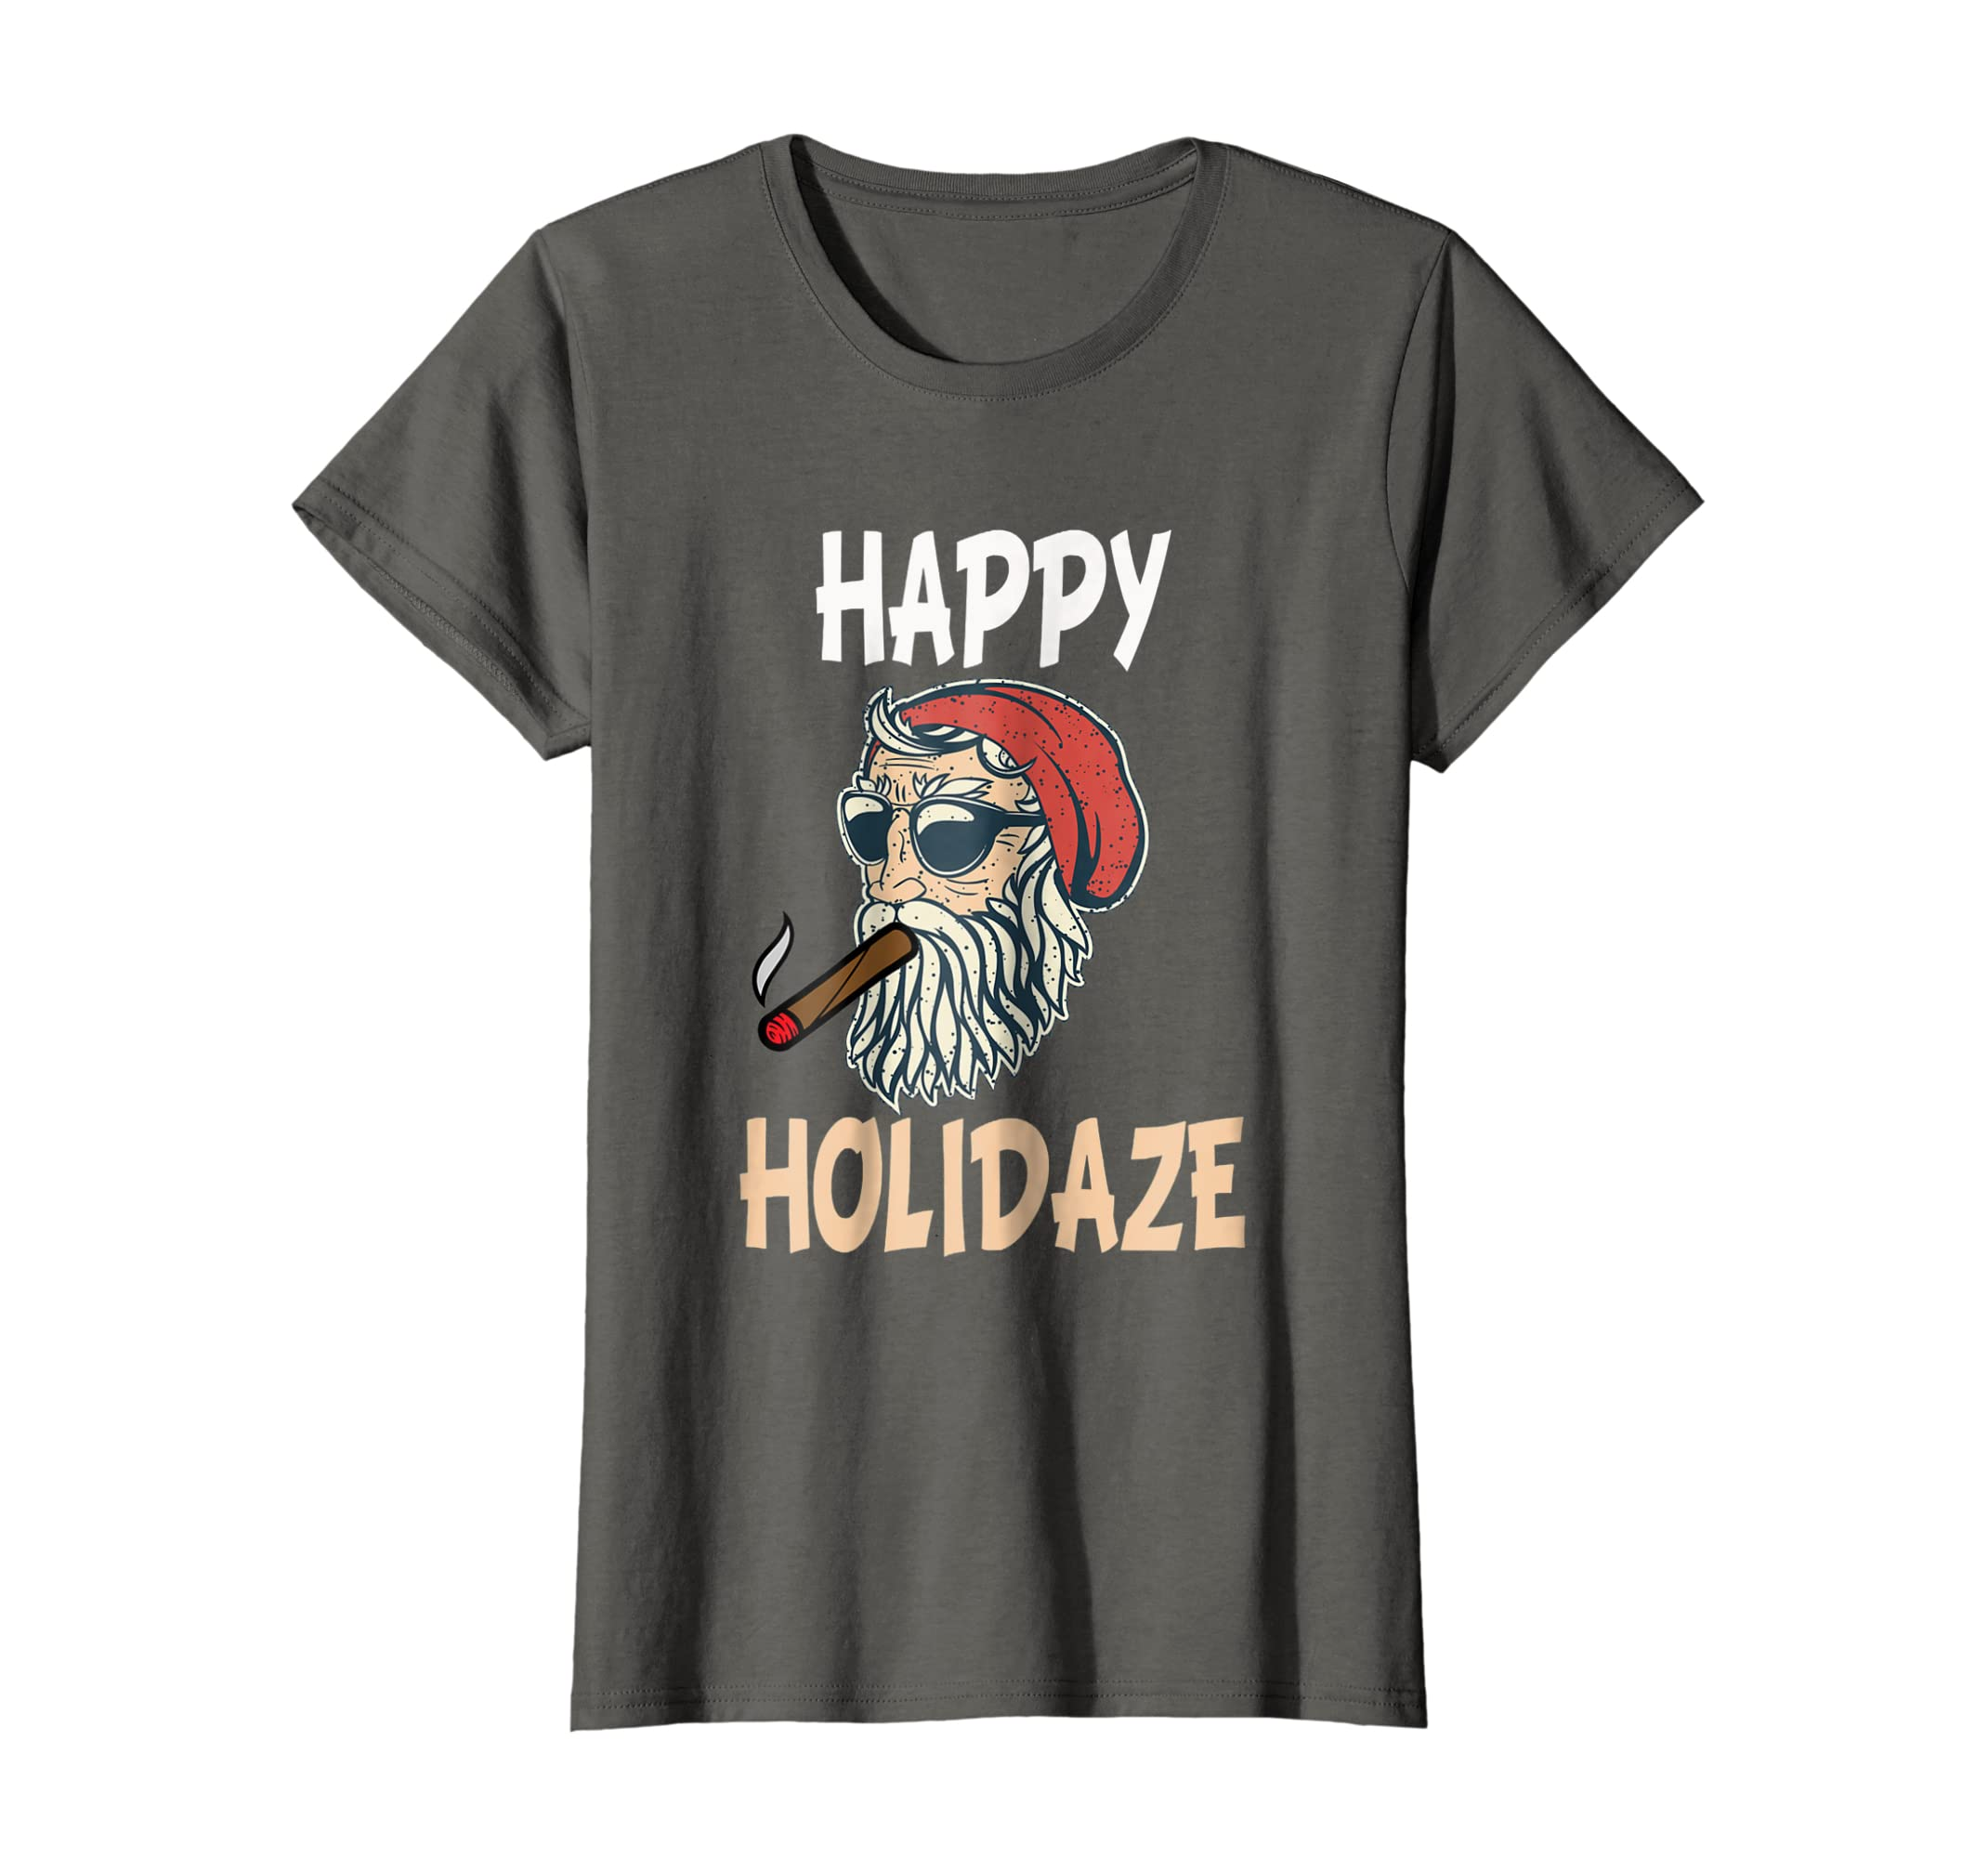 404e0cf5e Amazon.com: happy holidaze cannabis 420 weed christmas funny santa shirt:  Clothing